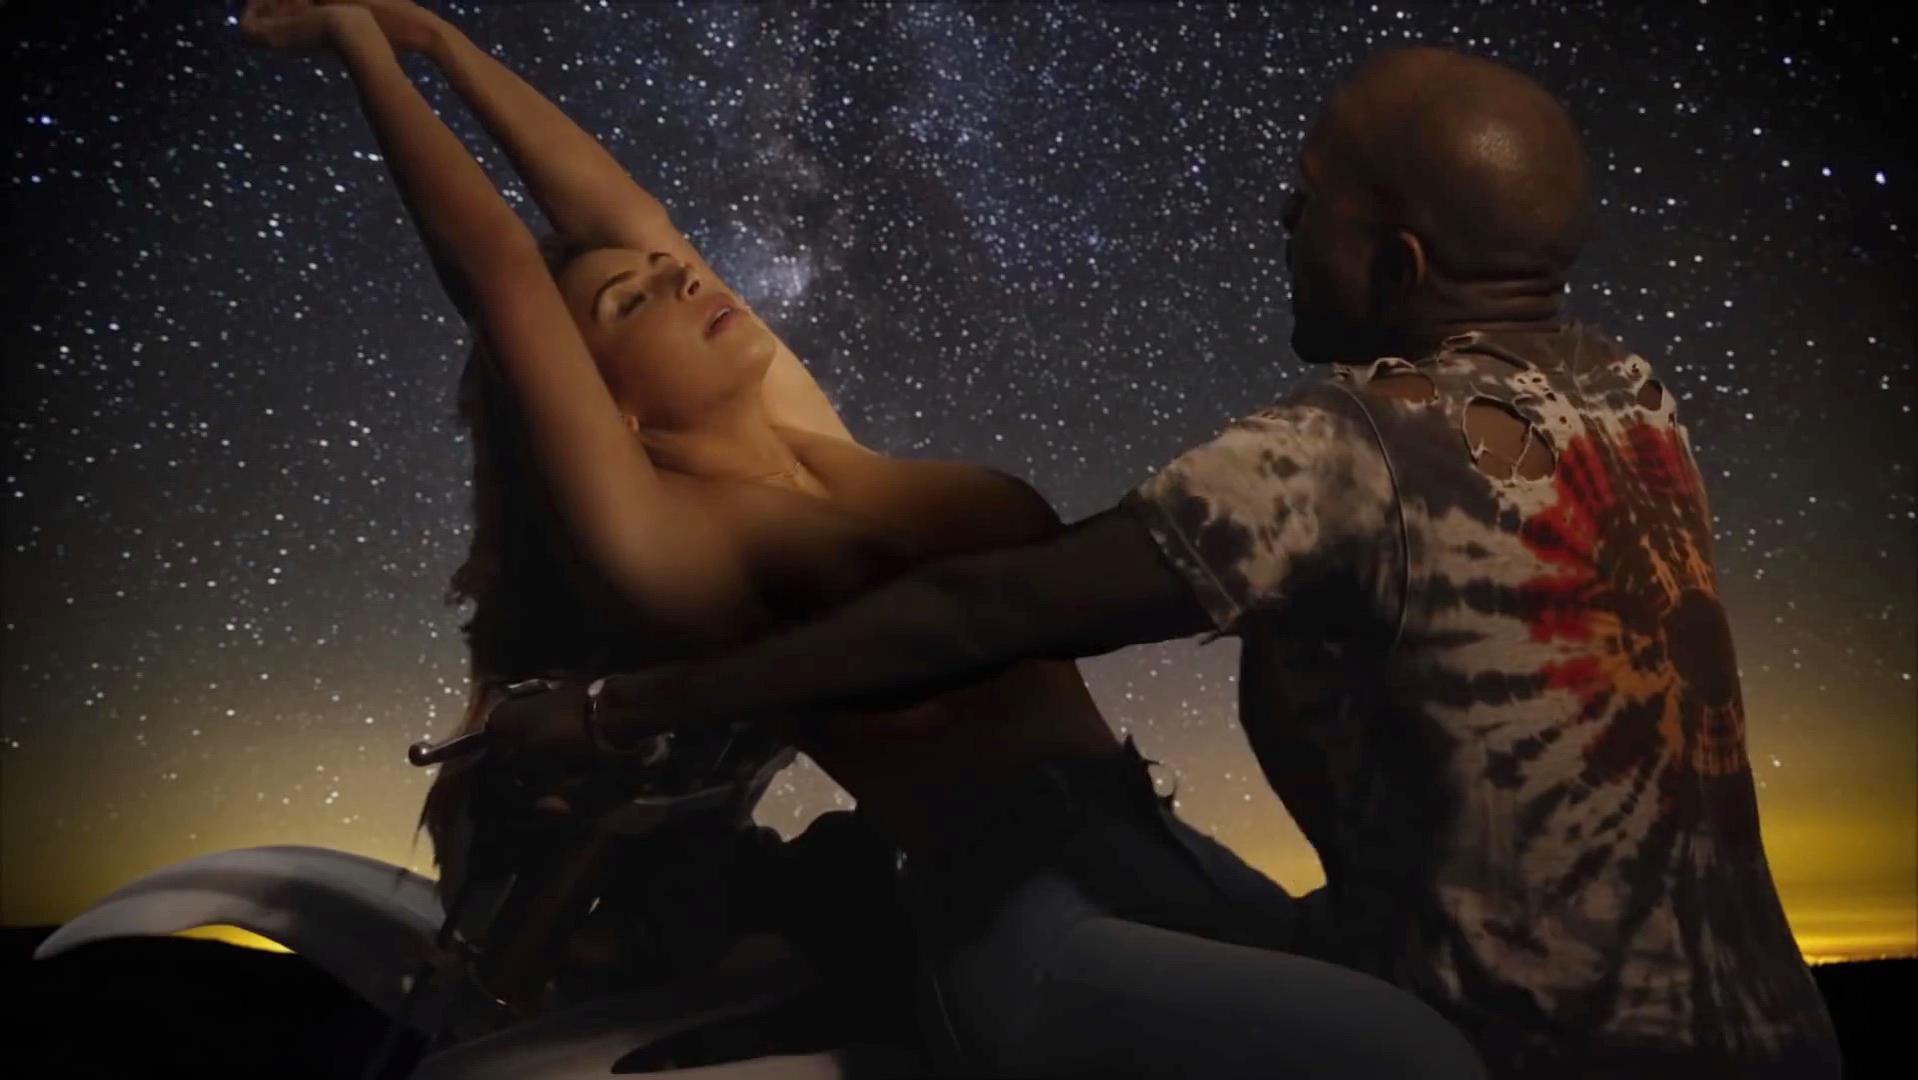 Nude Video Celebs  Kim Kardashian Nude - Bound 2 2013-2919